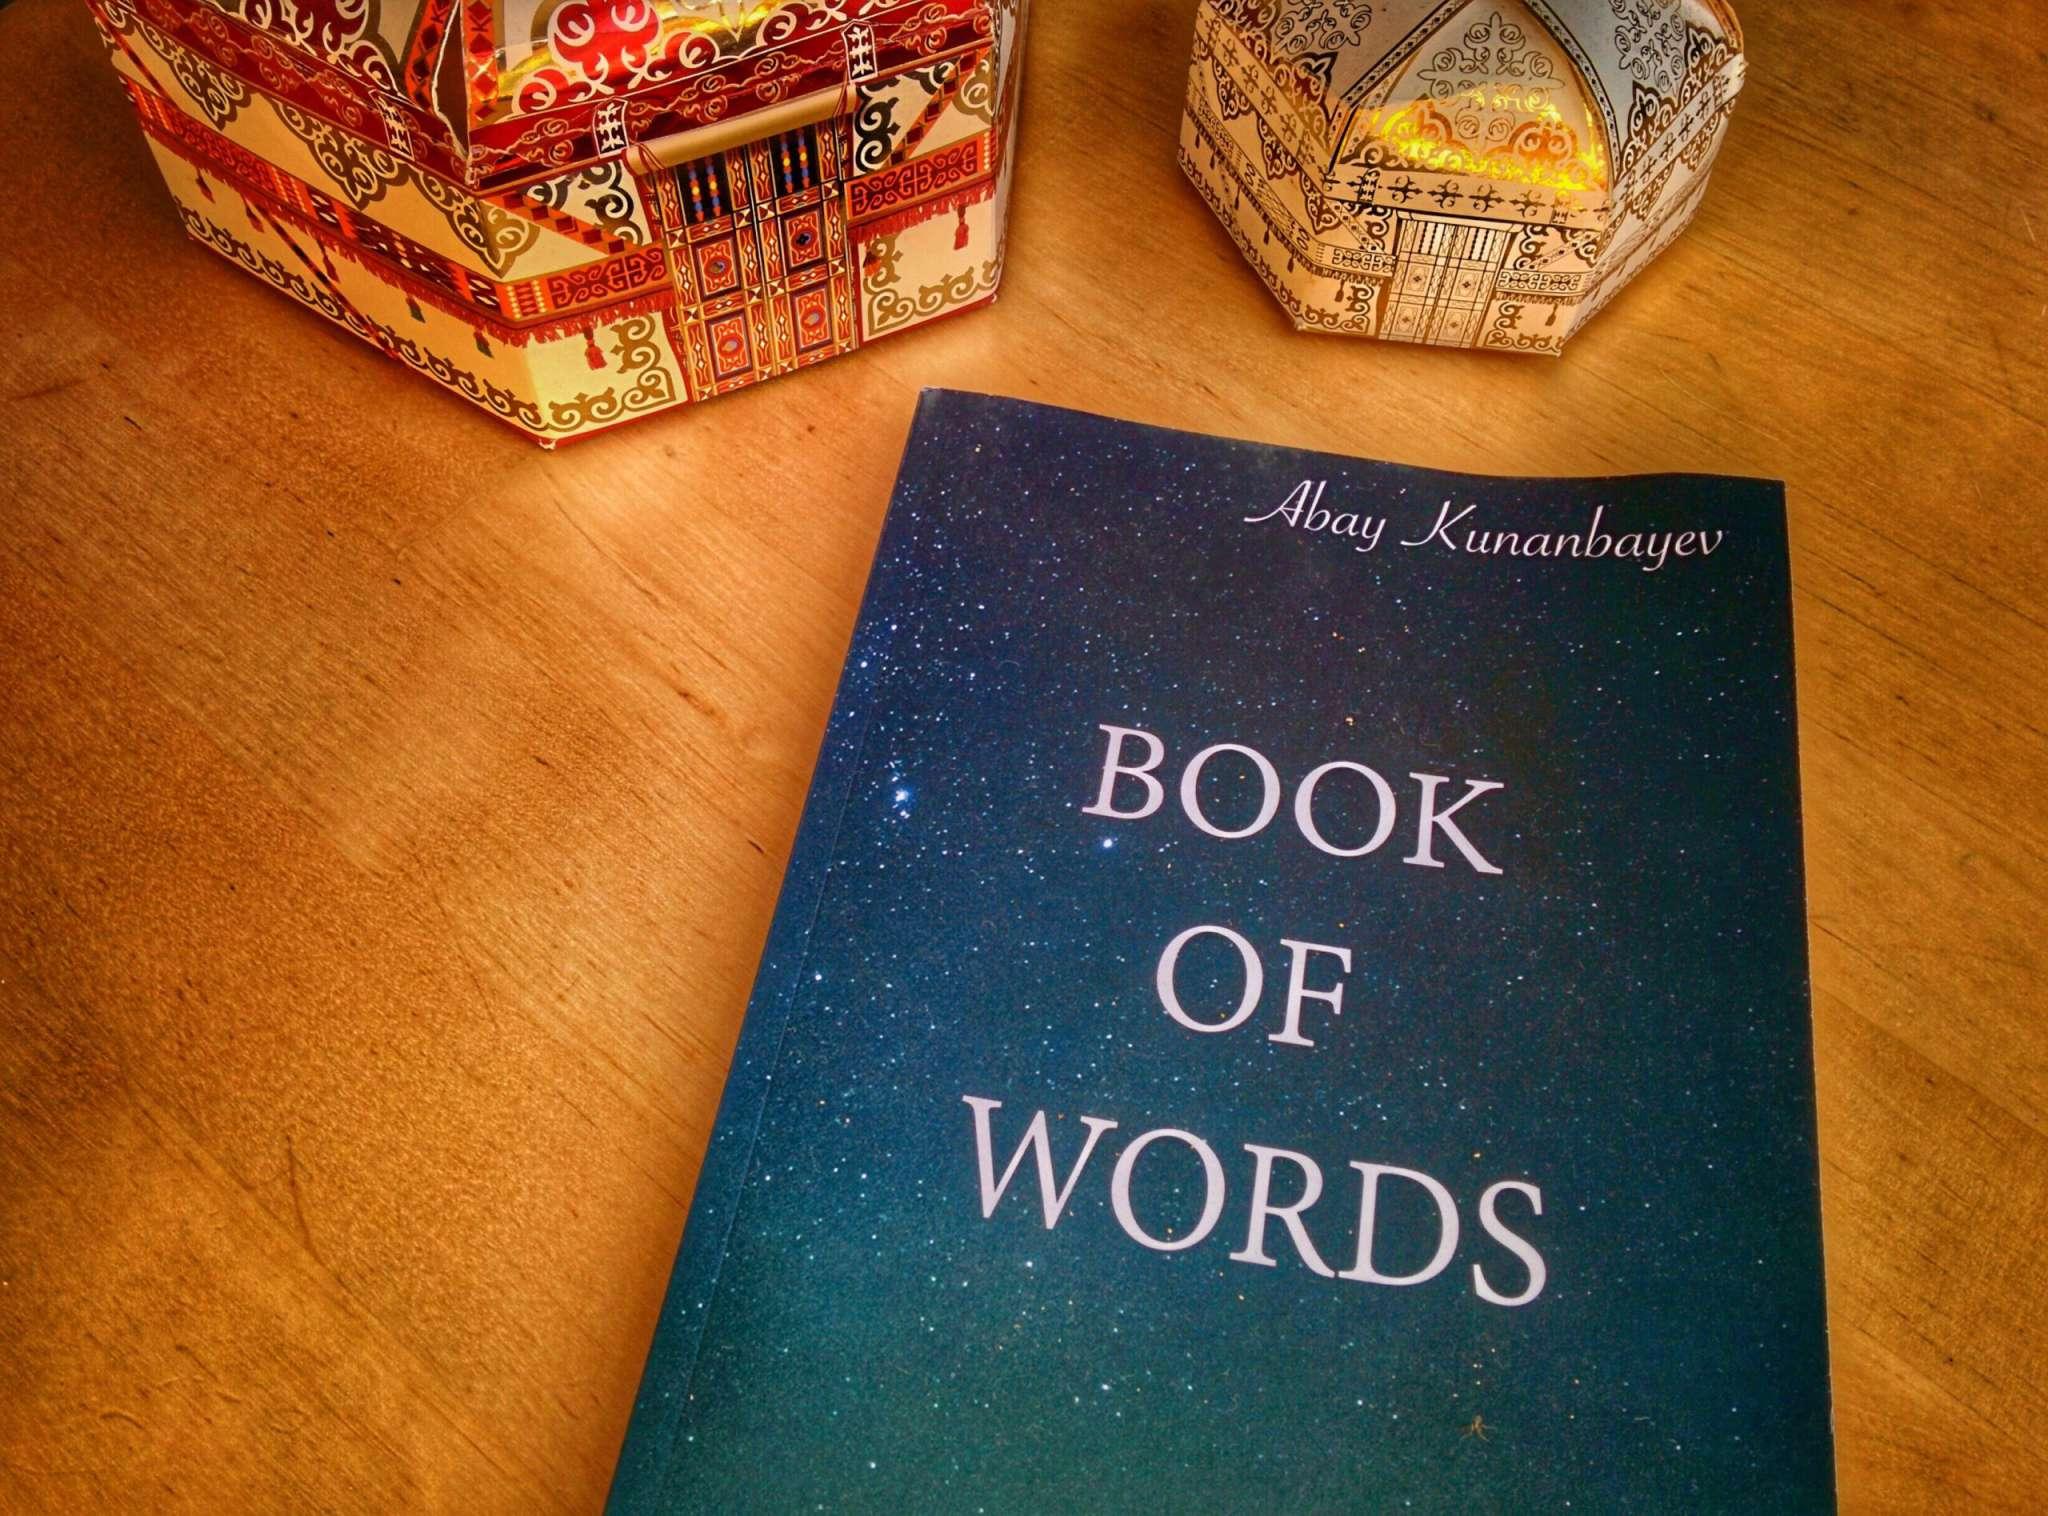 Info Shymkent - Abay Kunanbayev's Book of Words